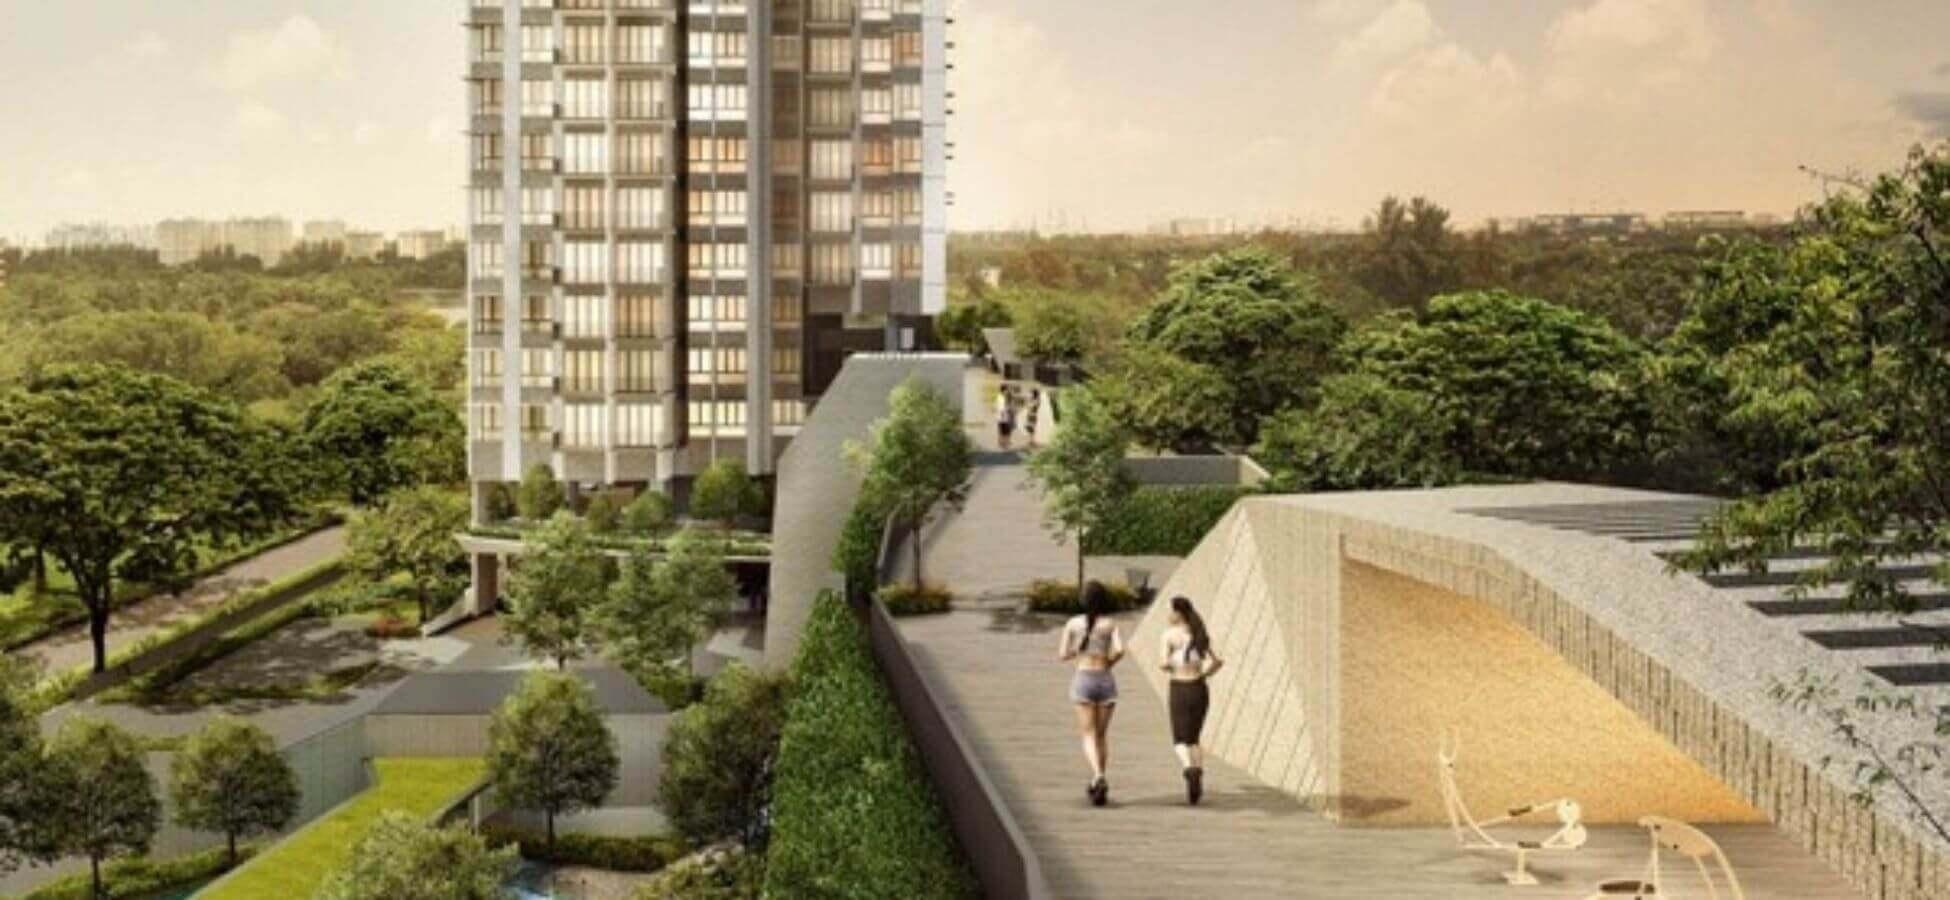 <span>Highline Residences</span> is a City-Fringe<br>D3 Development